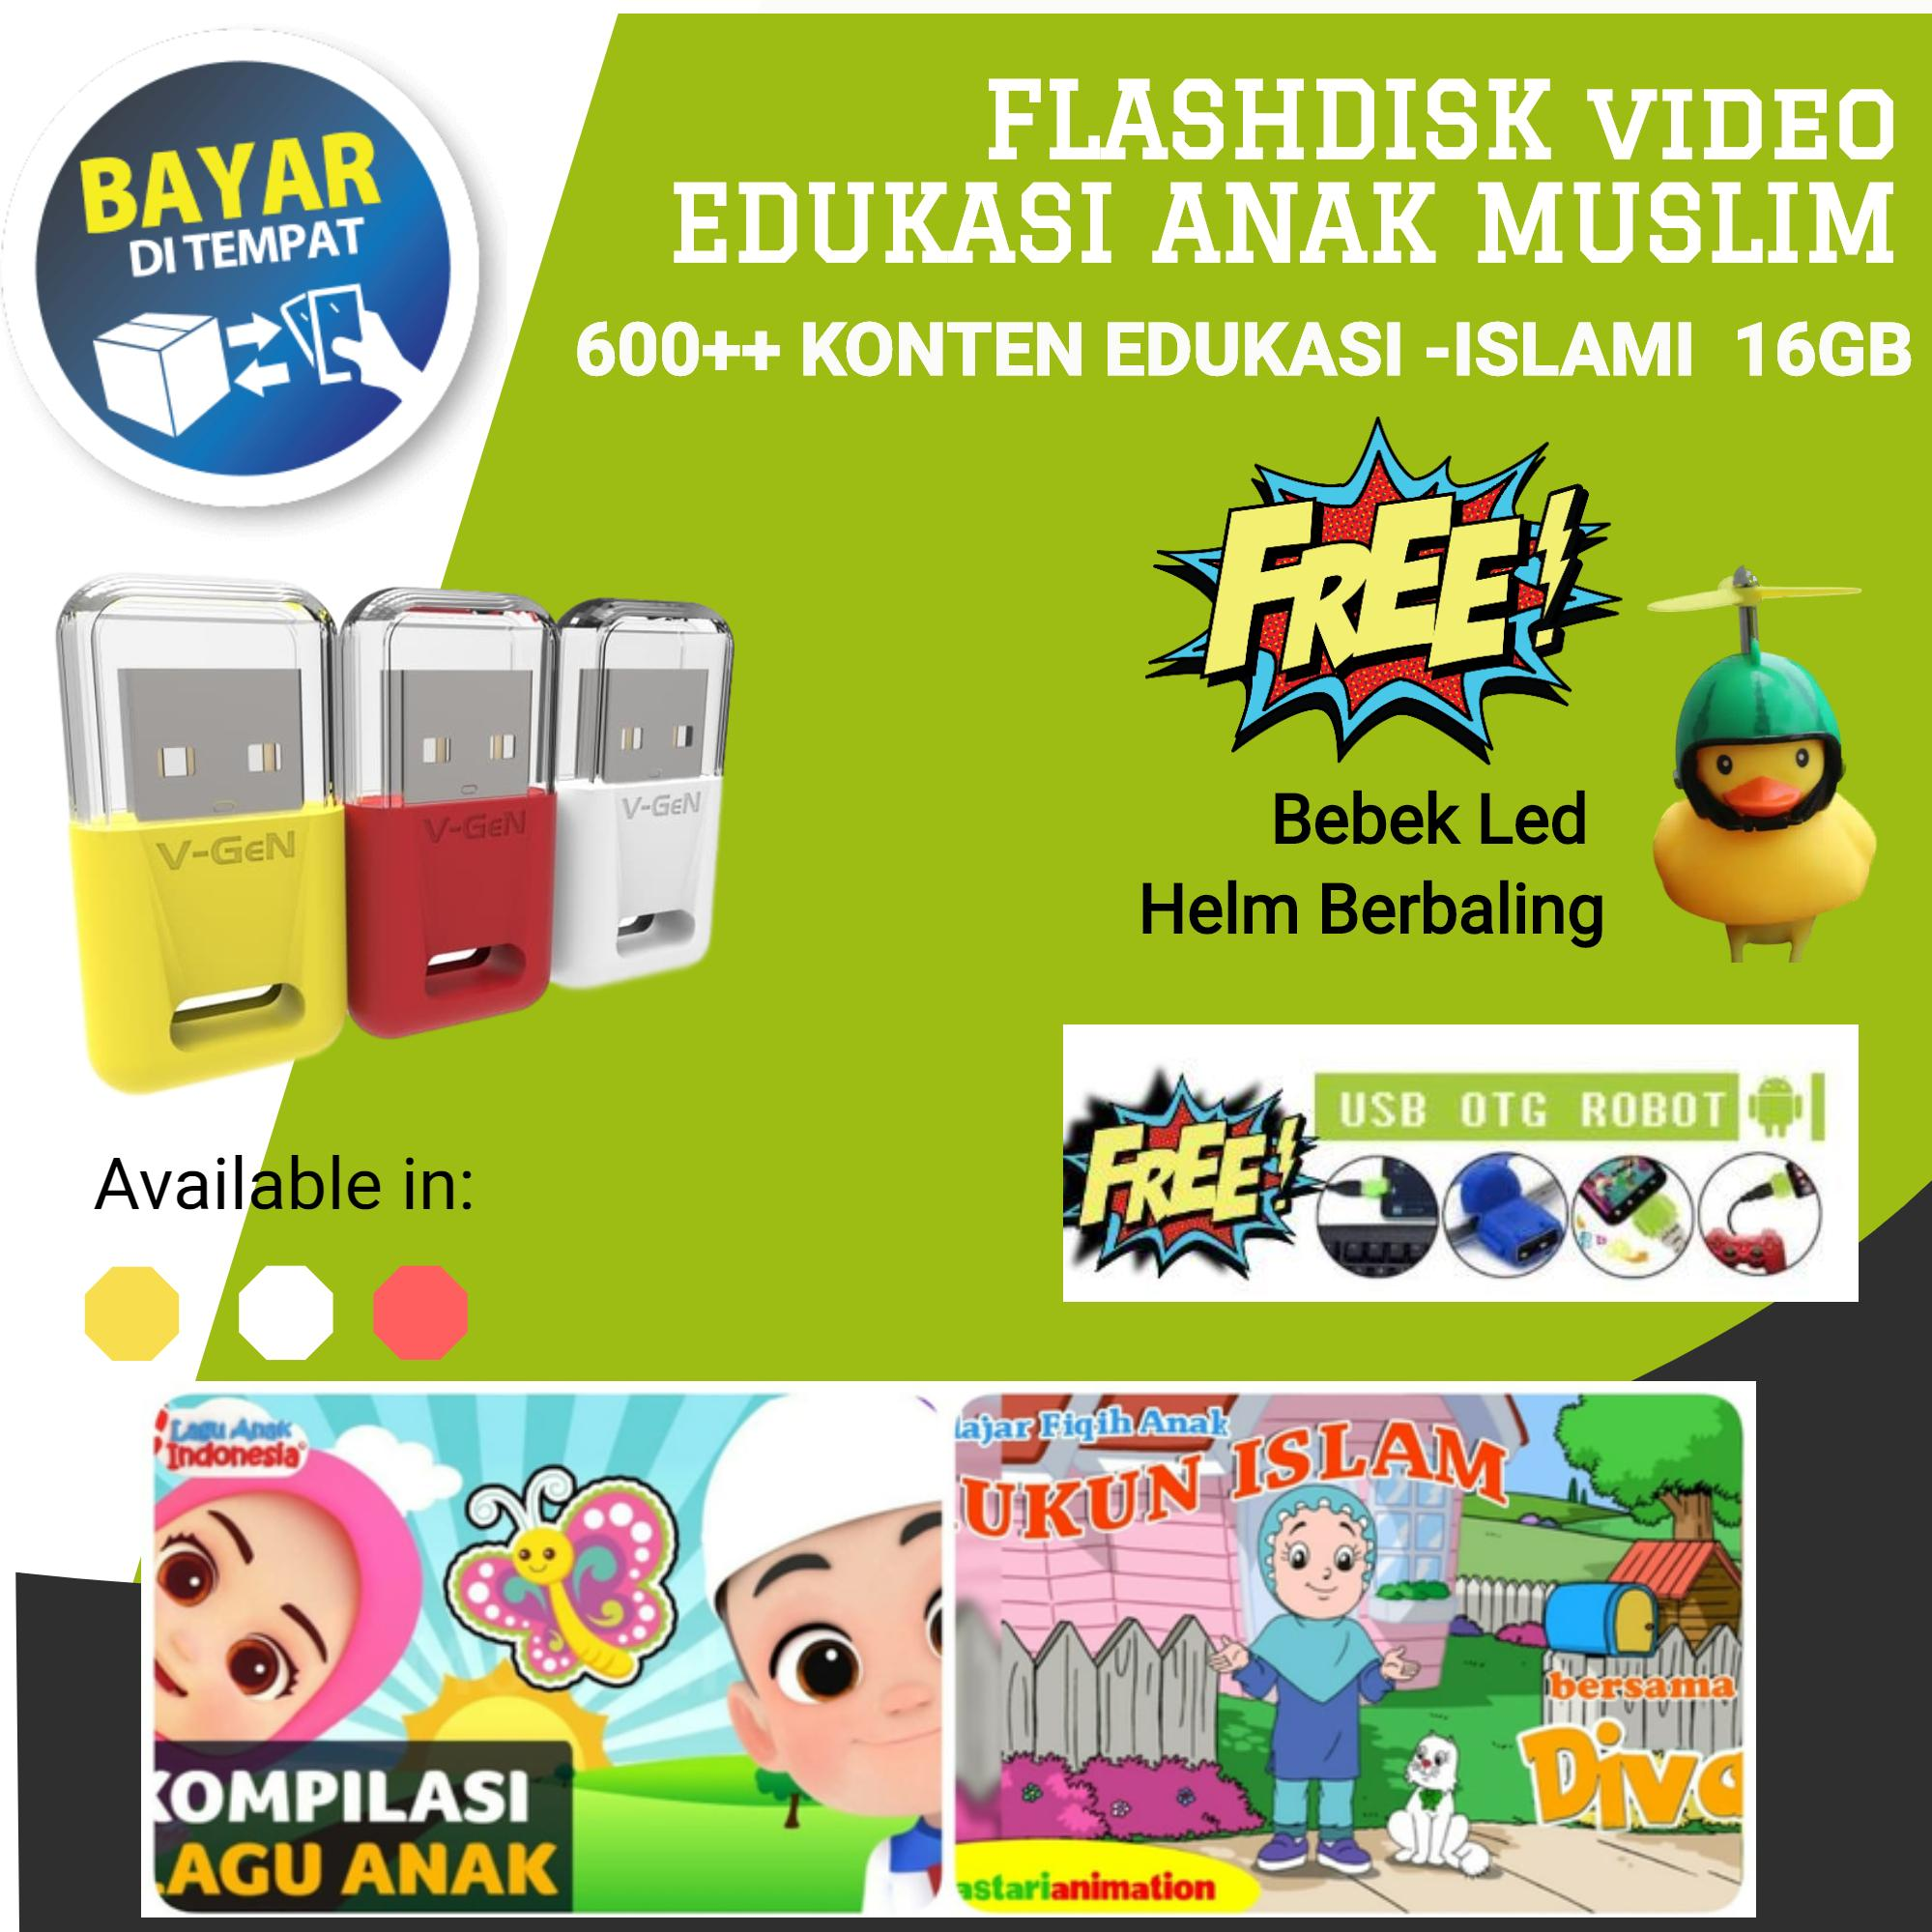 video edukasi anak islami flashdisk 16 gb gratis otg – gratis bebek led baling – bisa cod